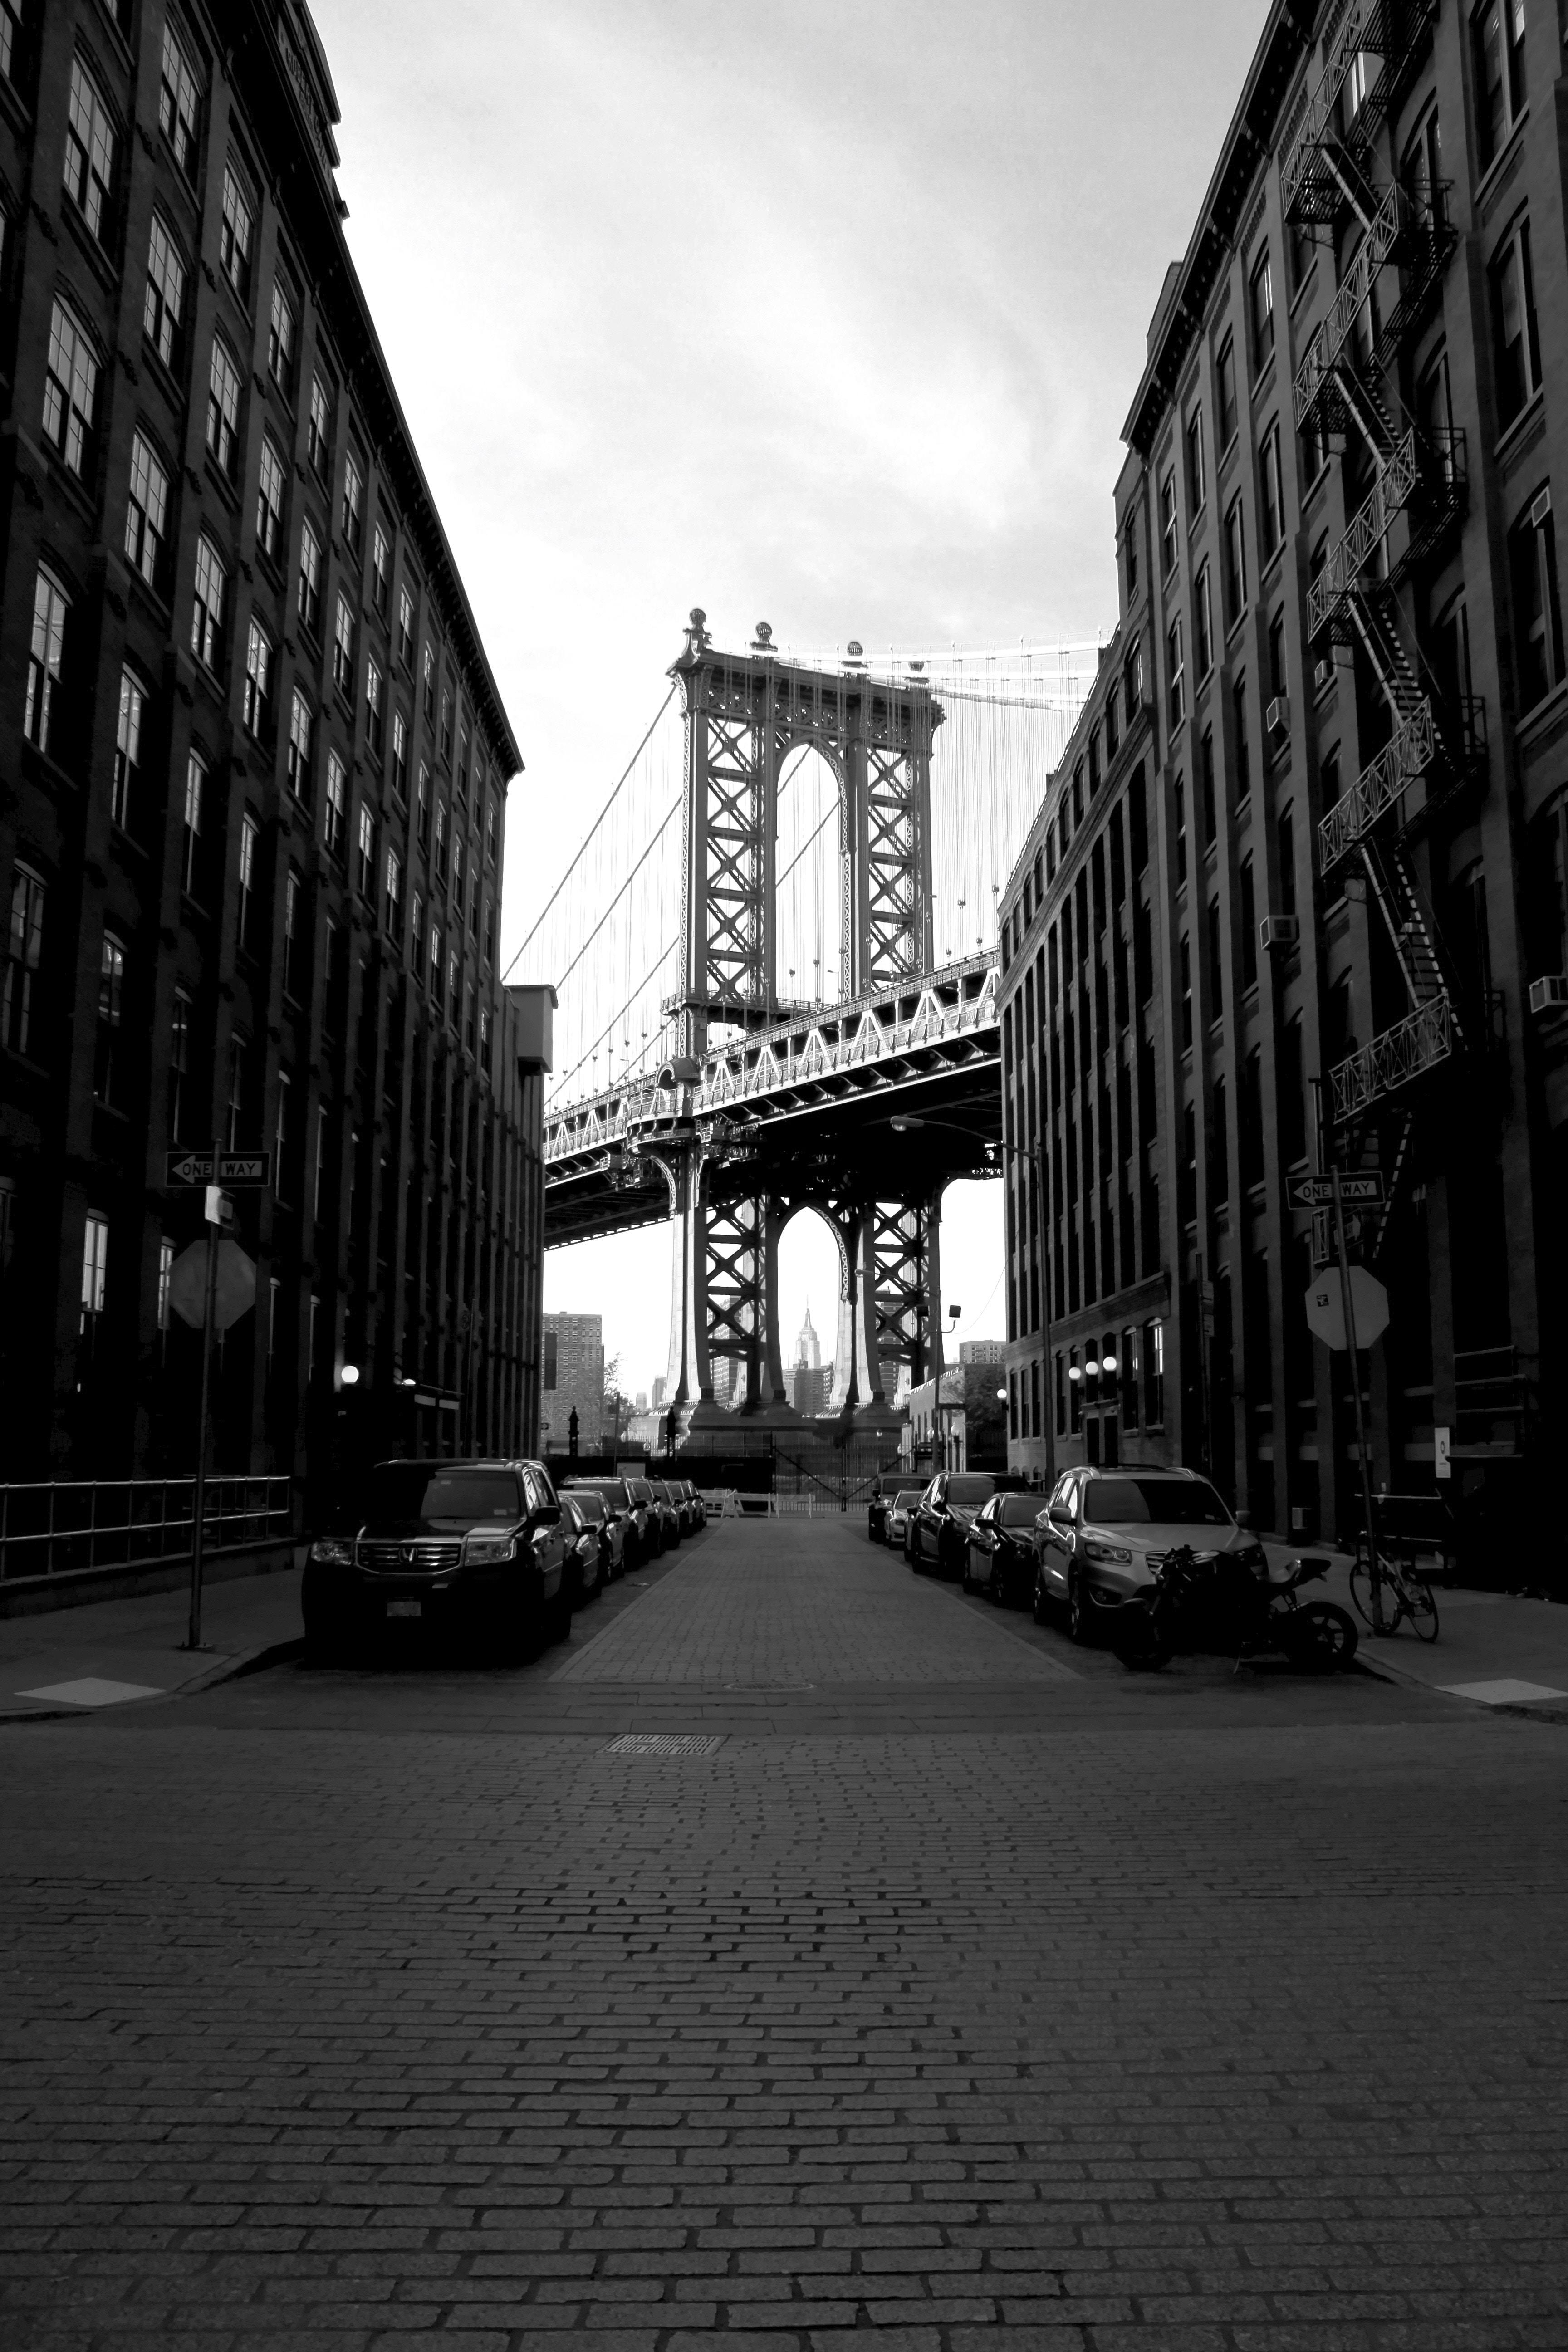 A view down a white street staring at a suspension bridge.